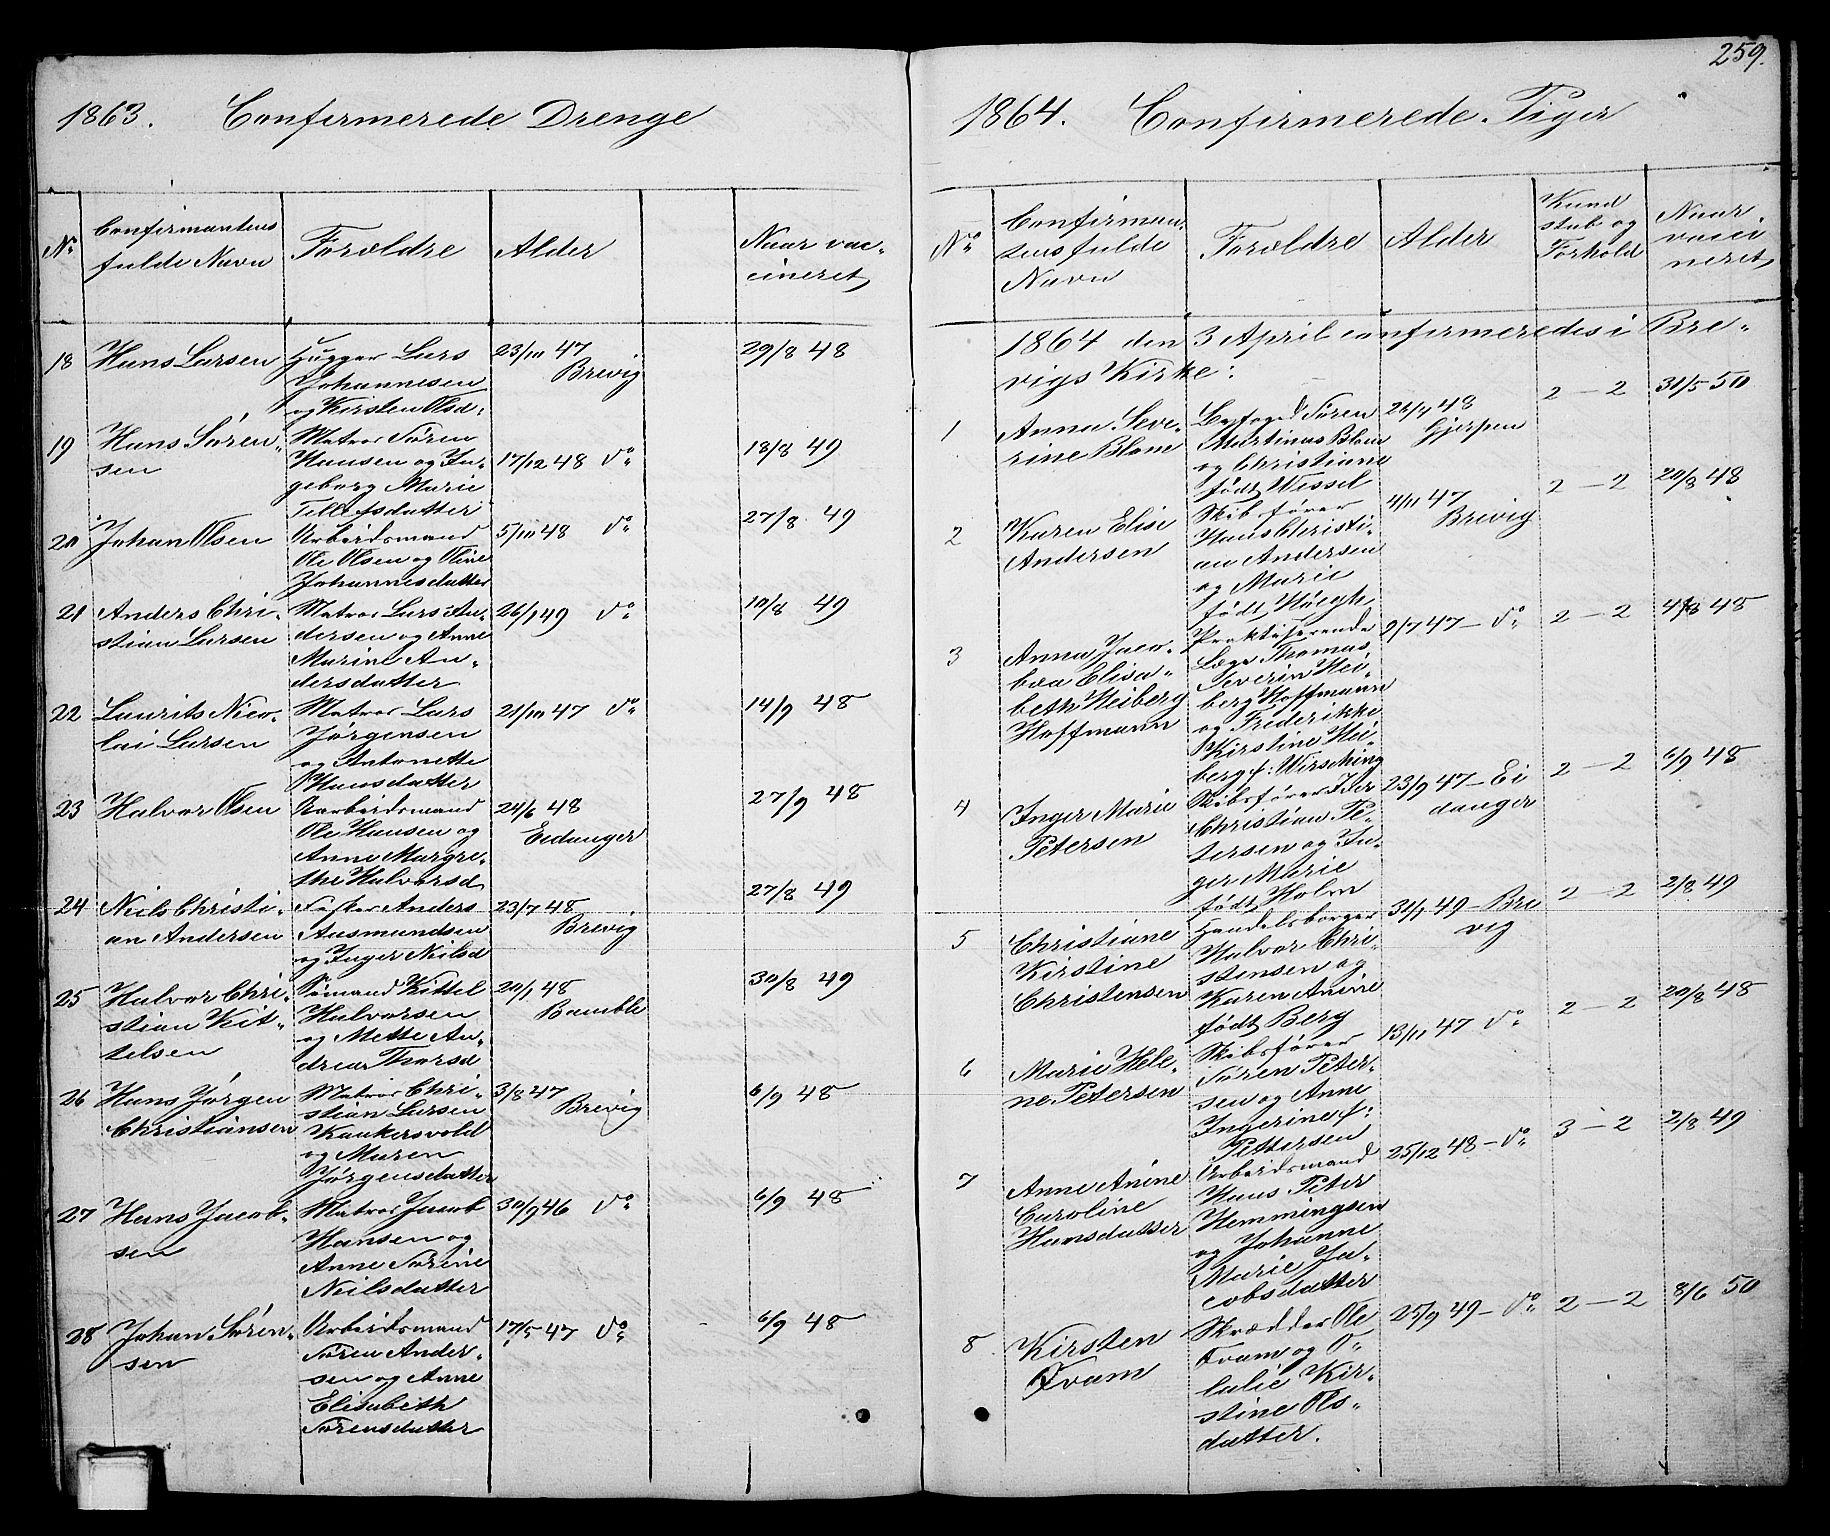 SAKO, Brevik kirkebøker, G/Ga/L0002: Klokkerbok nr. 2, 1846-1865, s. 259